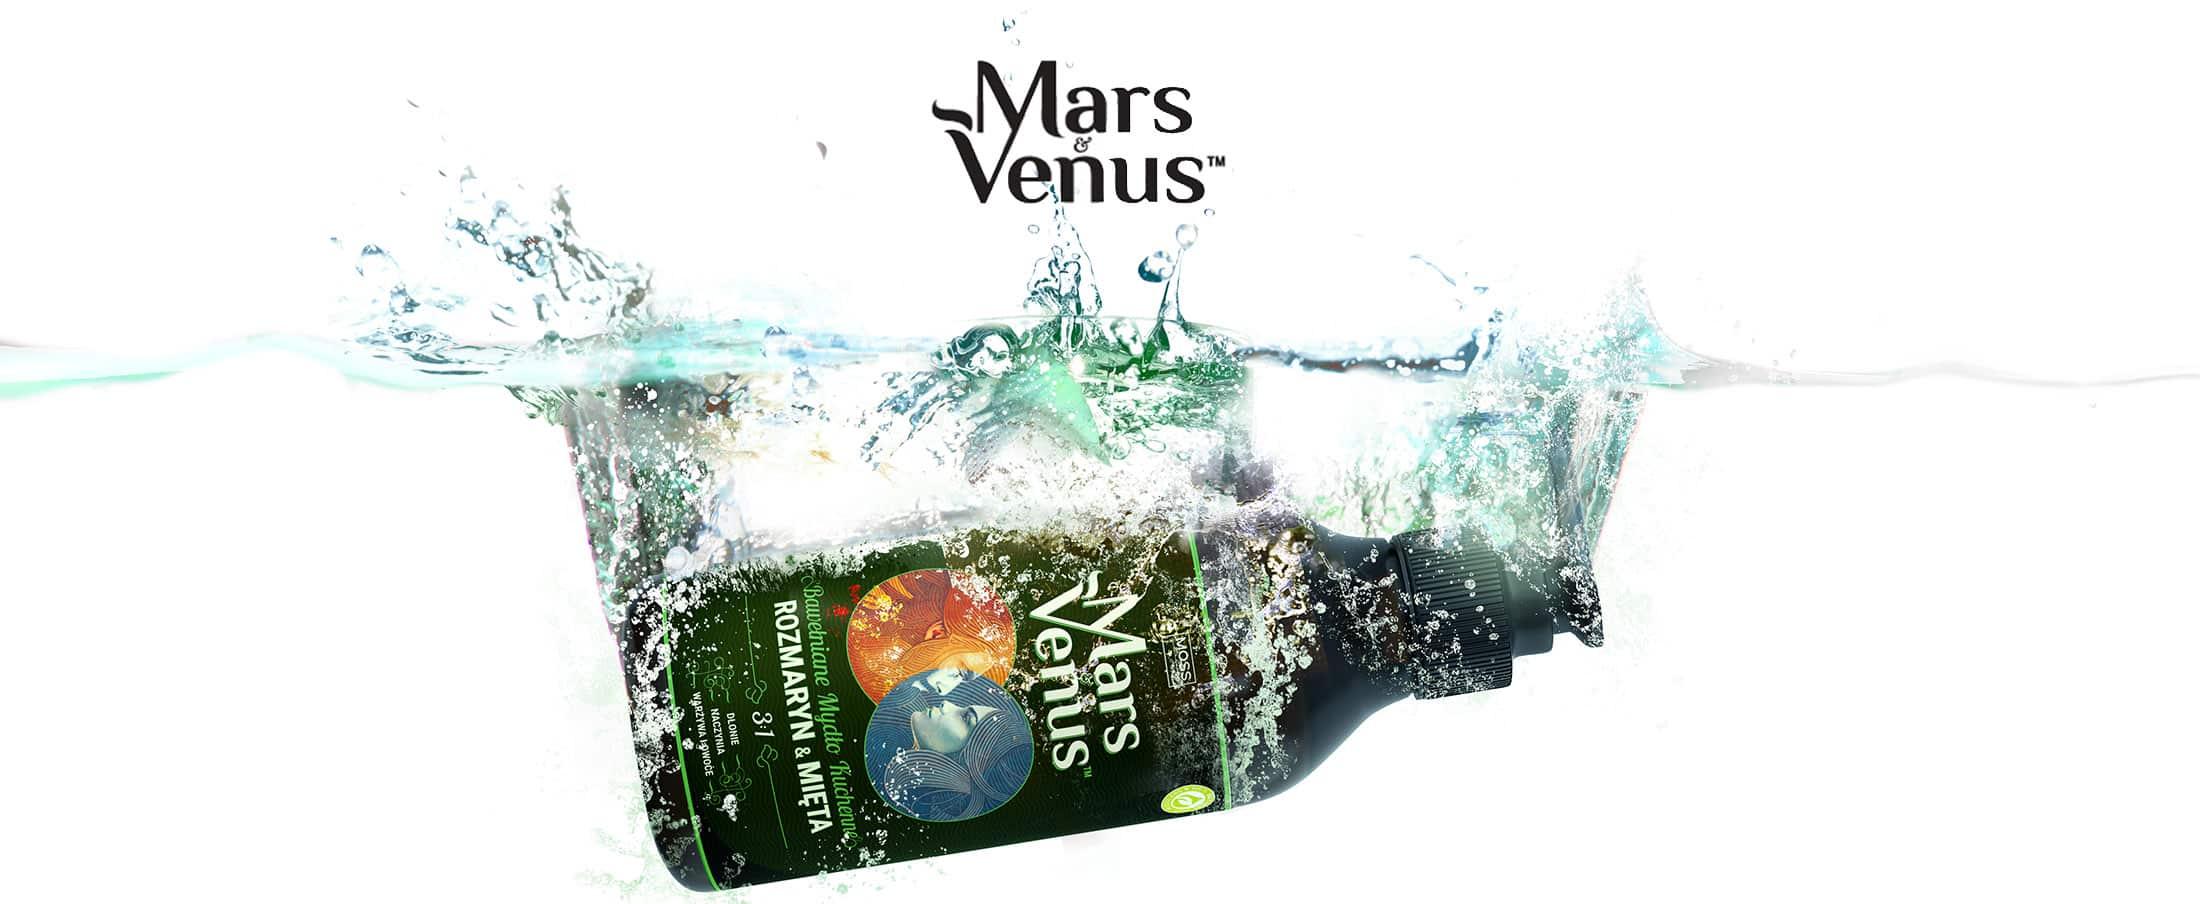 Mars i Venus_KV_water_MIETA